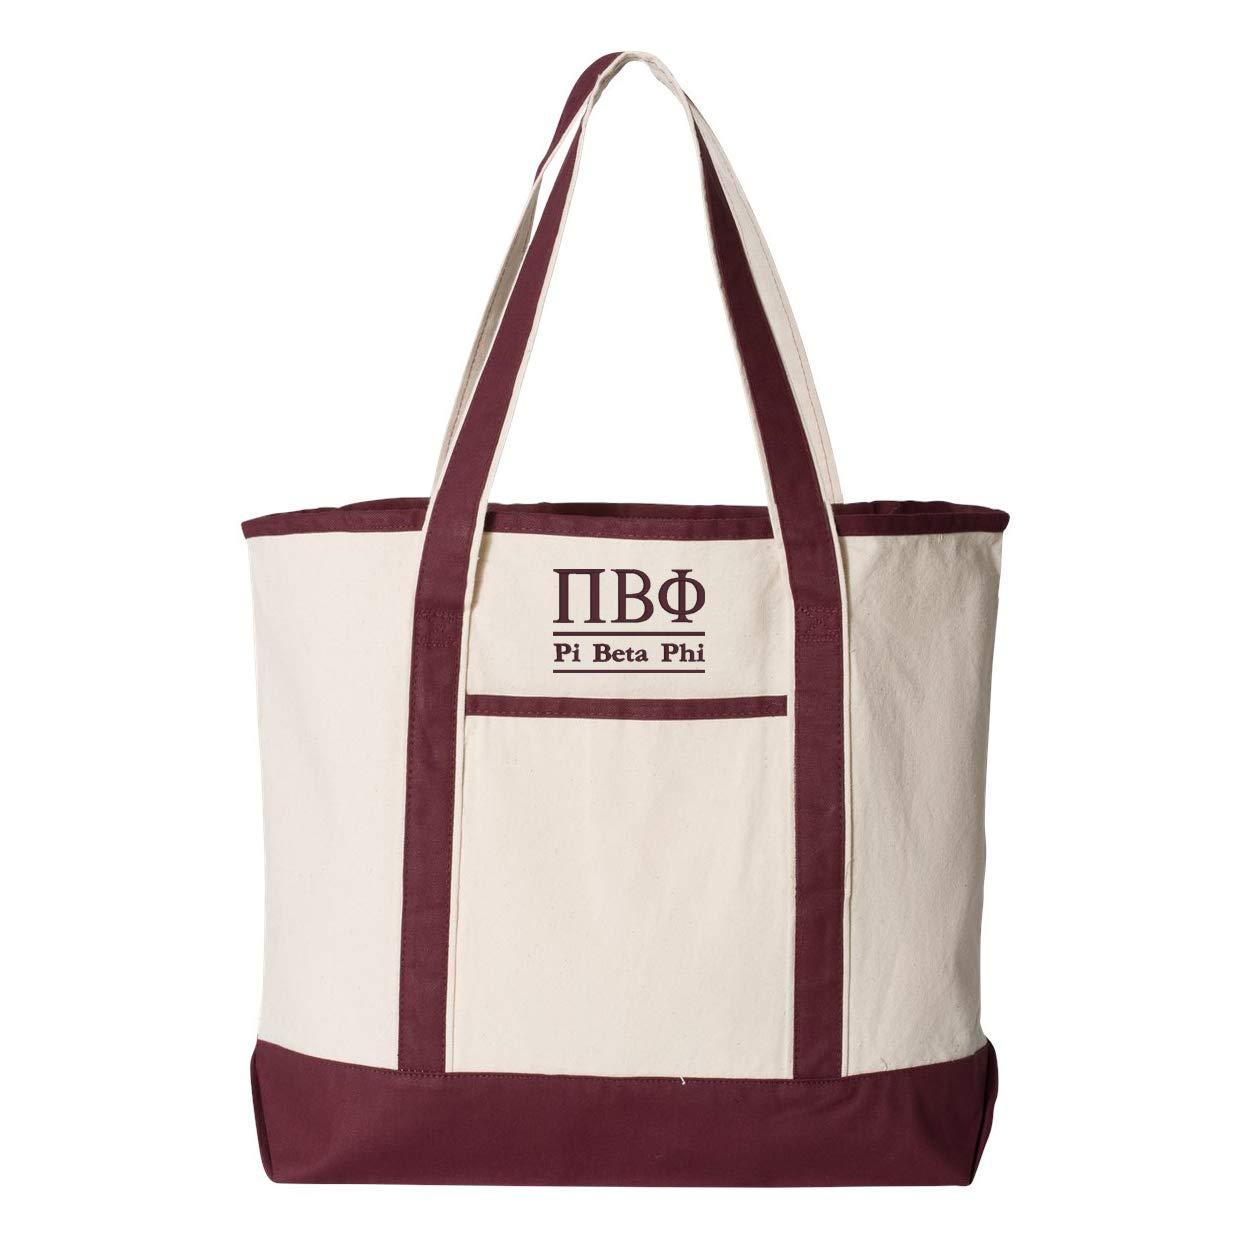 Pi Beta Phi Large Canvas Tote Bag